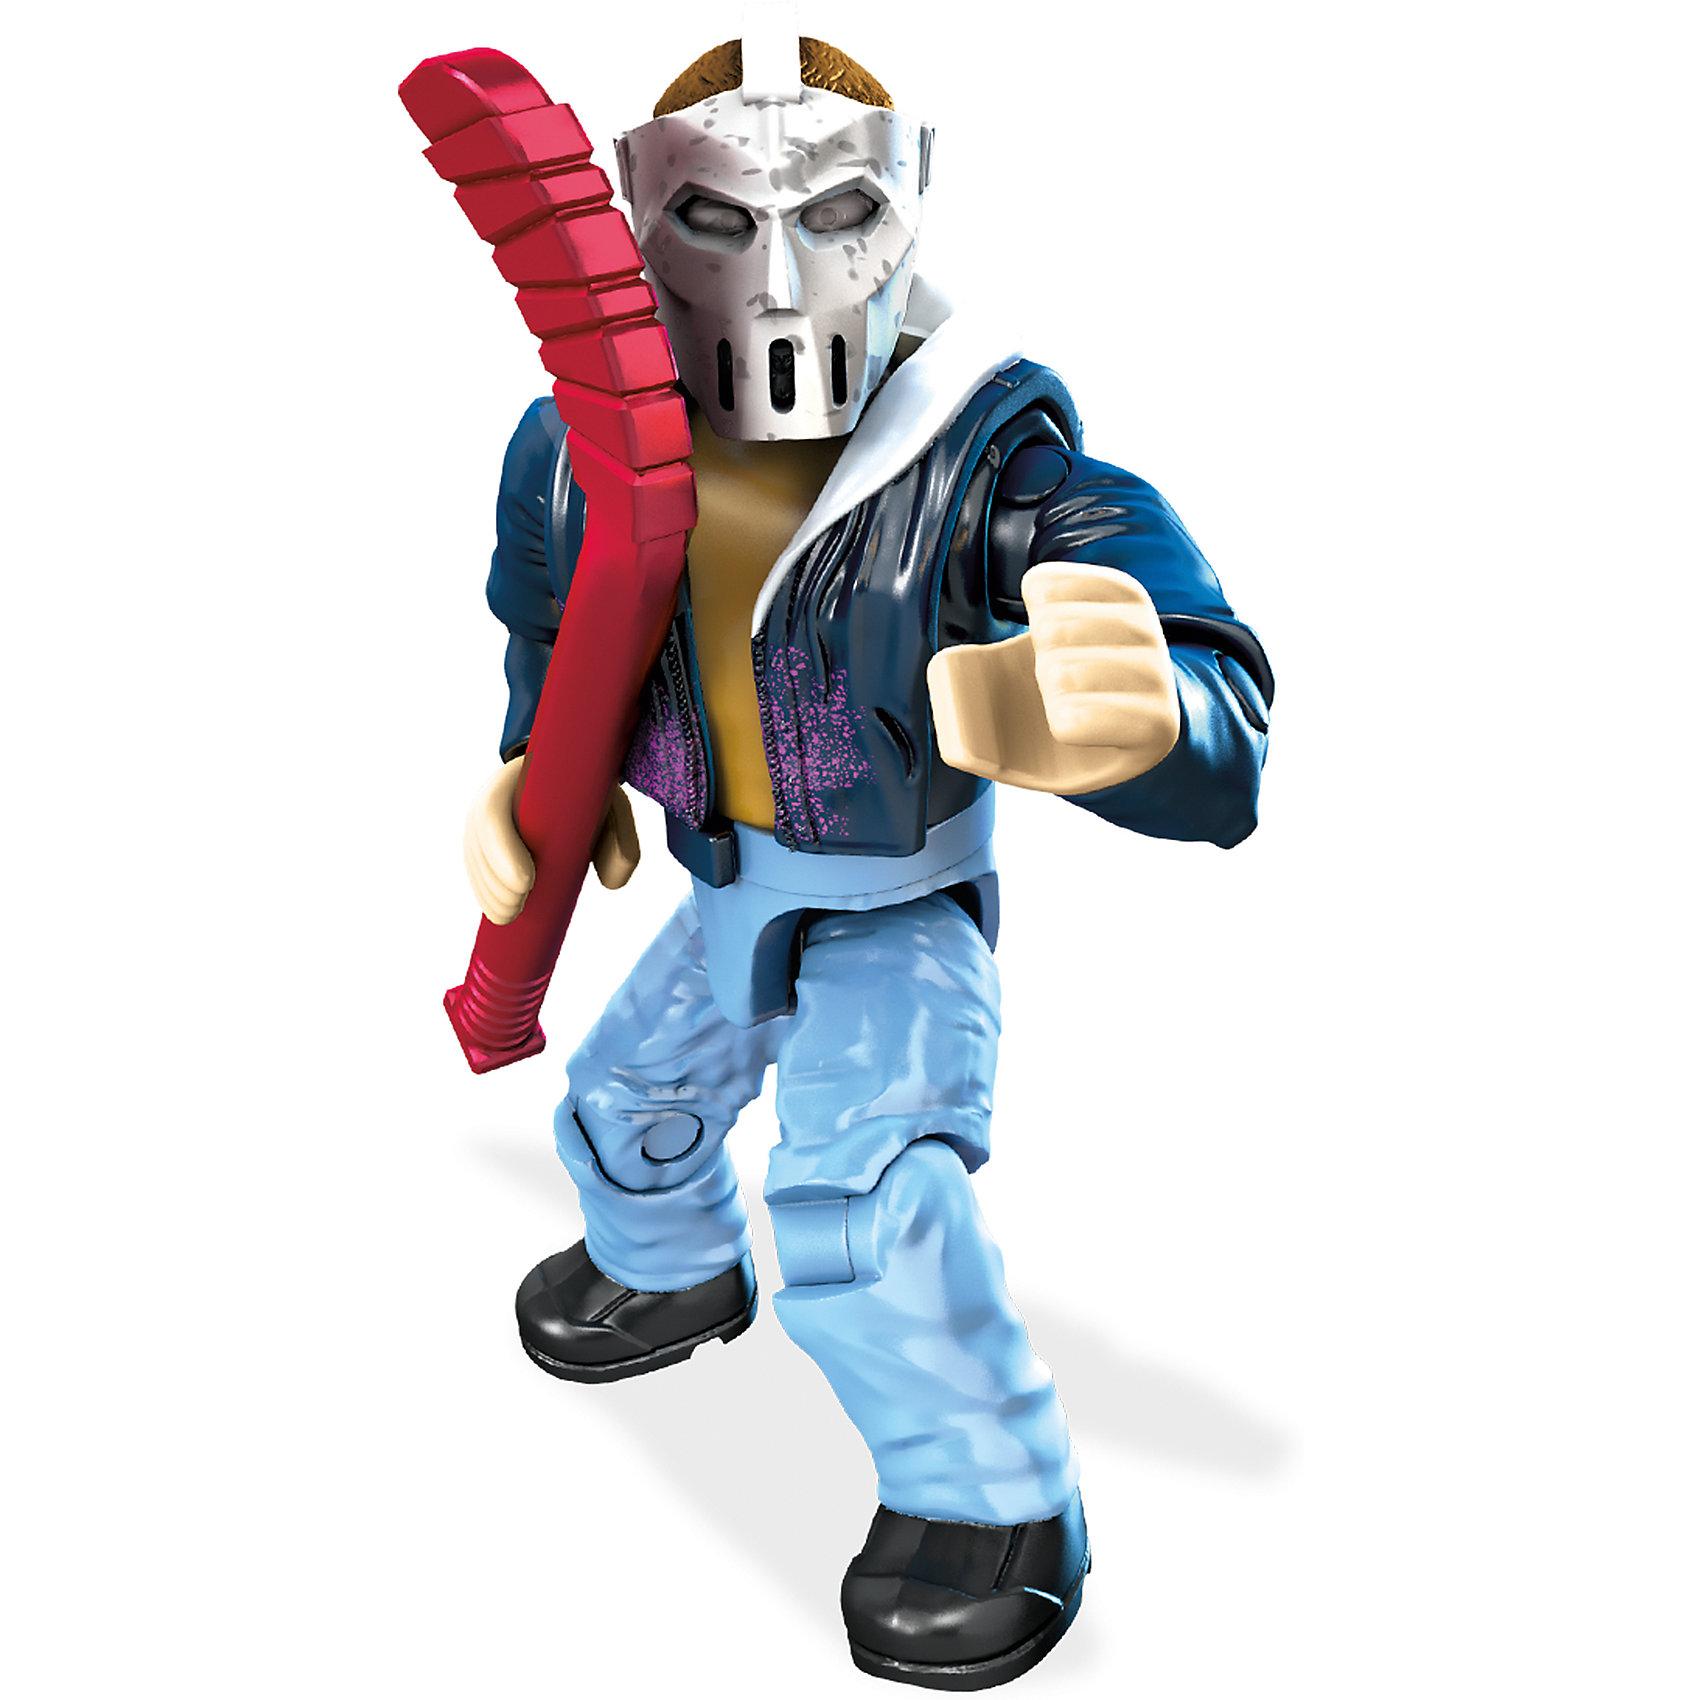 MEGA BLOKS Фигурка персонажа фильма Черепашки Ниндзя II, Mega Bloks фигурка к конструктору mega bloks могучий рейнджер с планером